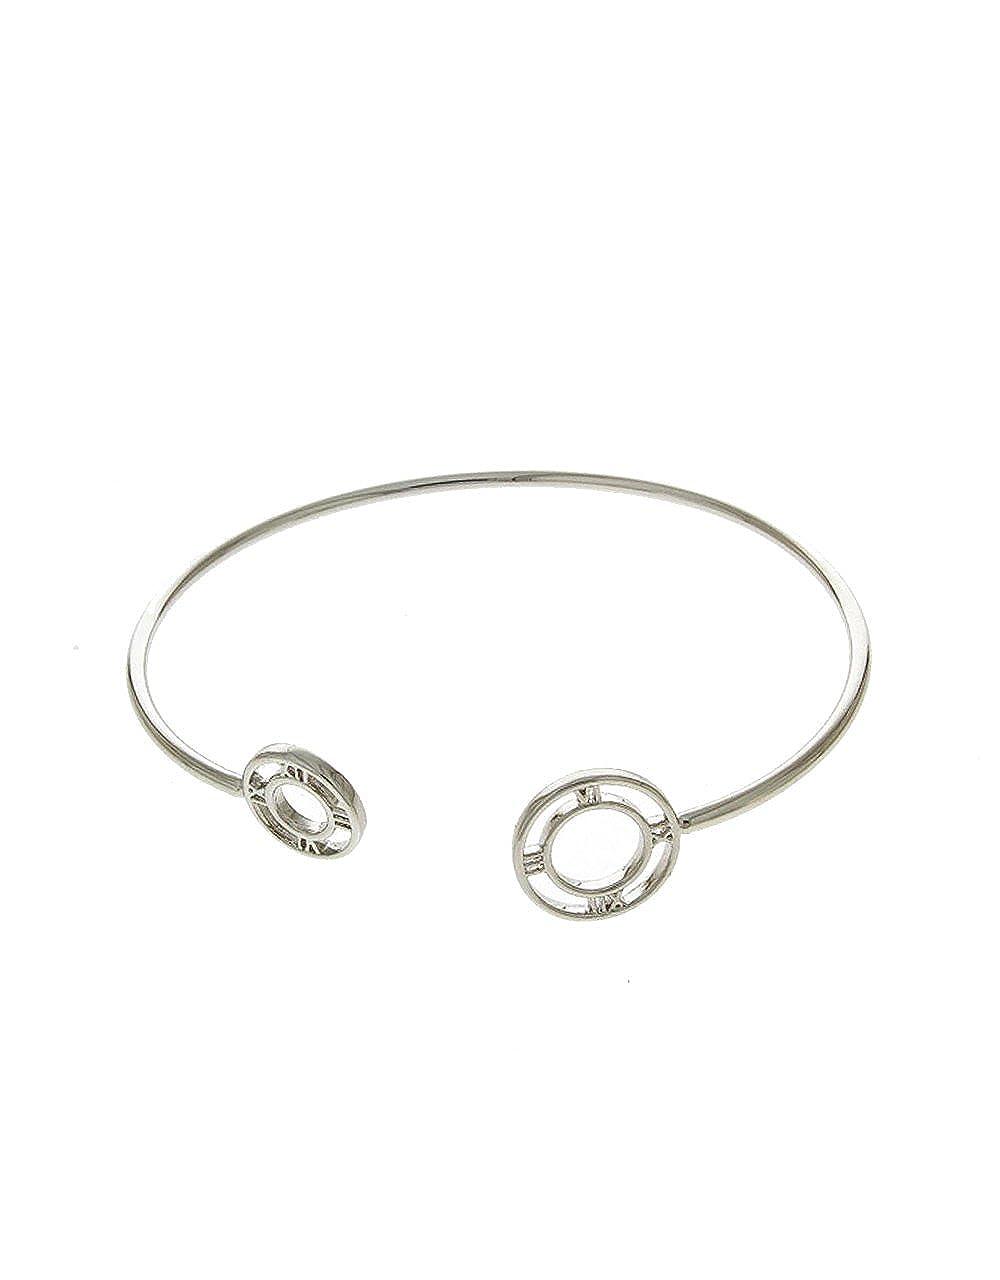 Evereena Silver Beads Bracelet for Girls Hope Charm Luxury Womens Jewelry